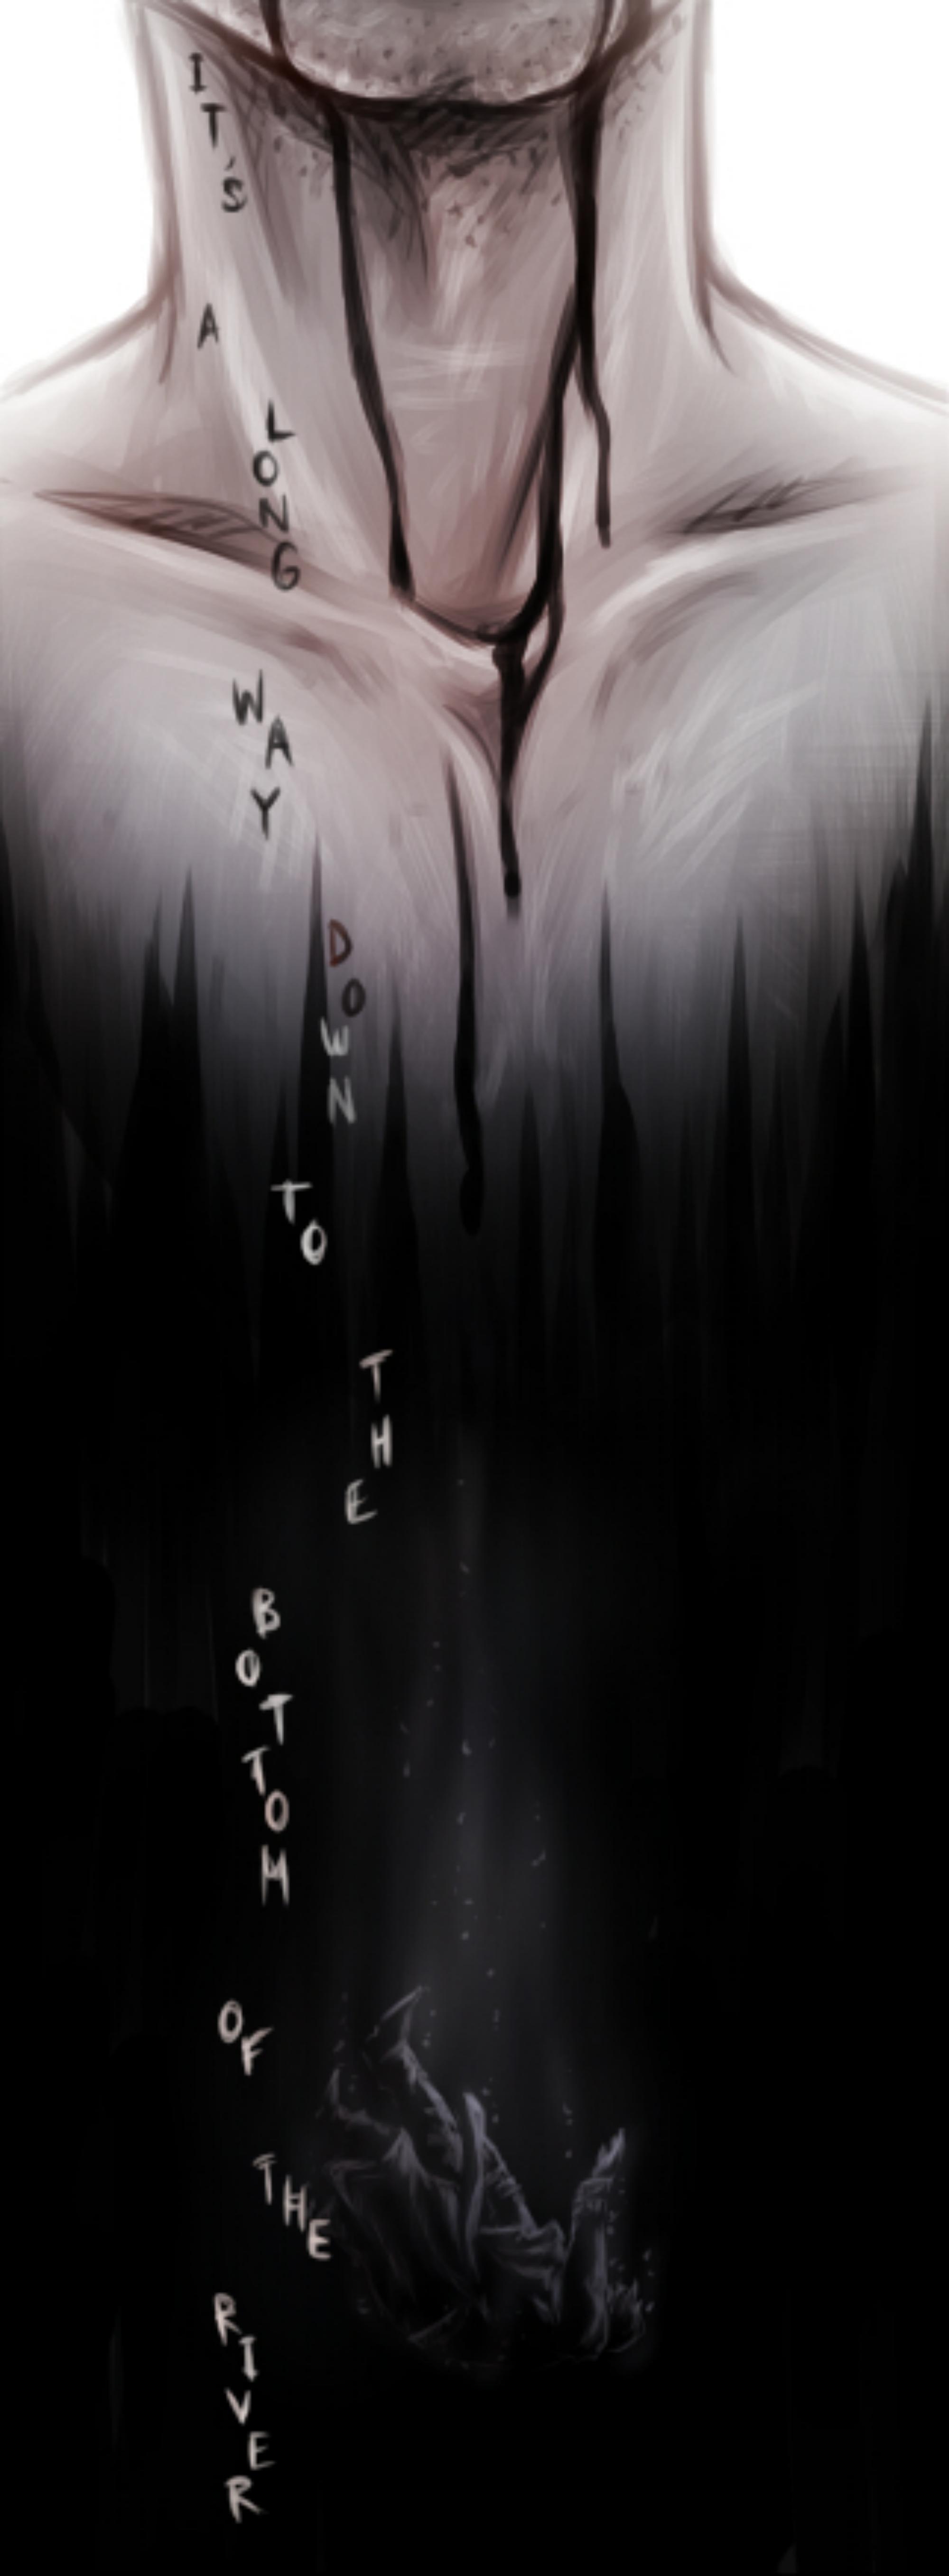 Supernatural/#989153 - Zerochan